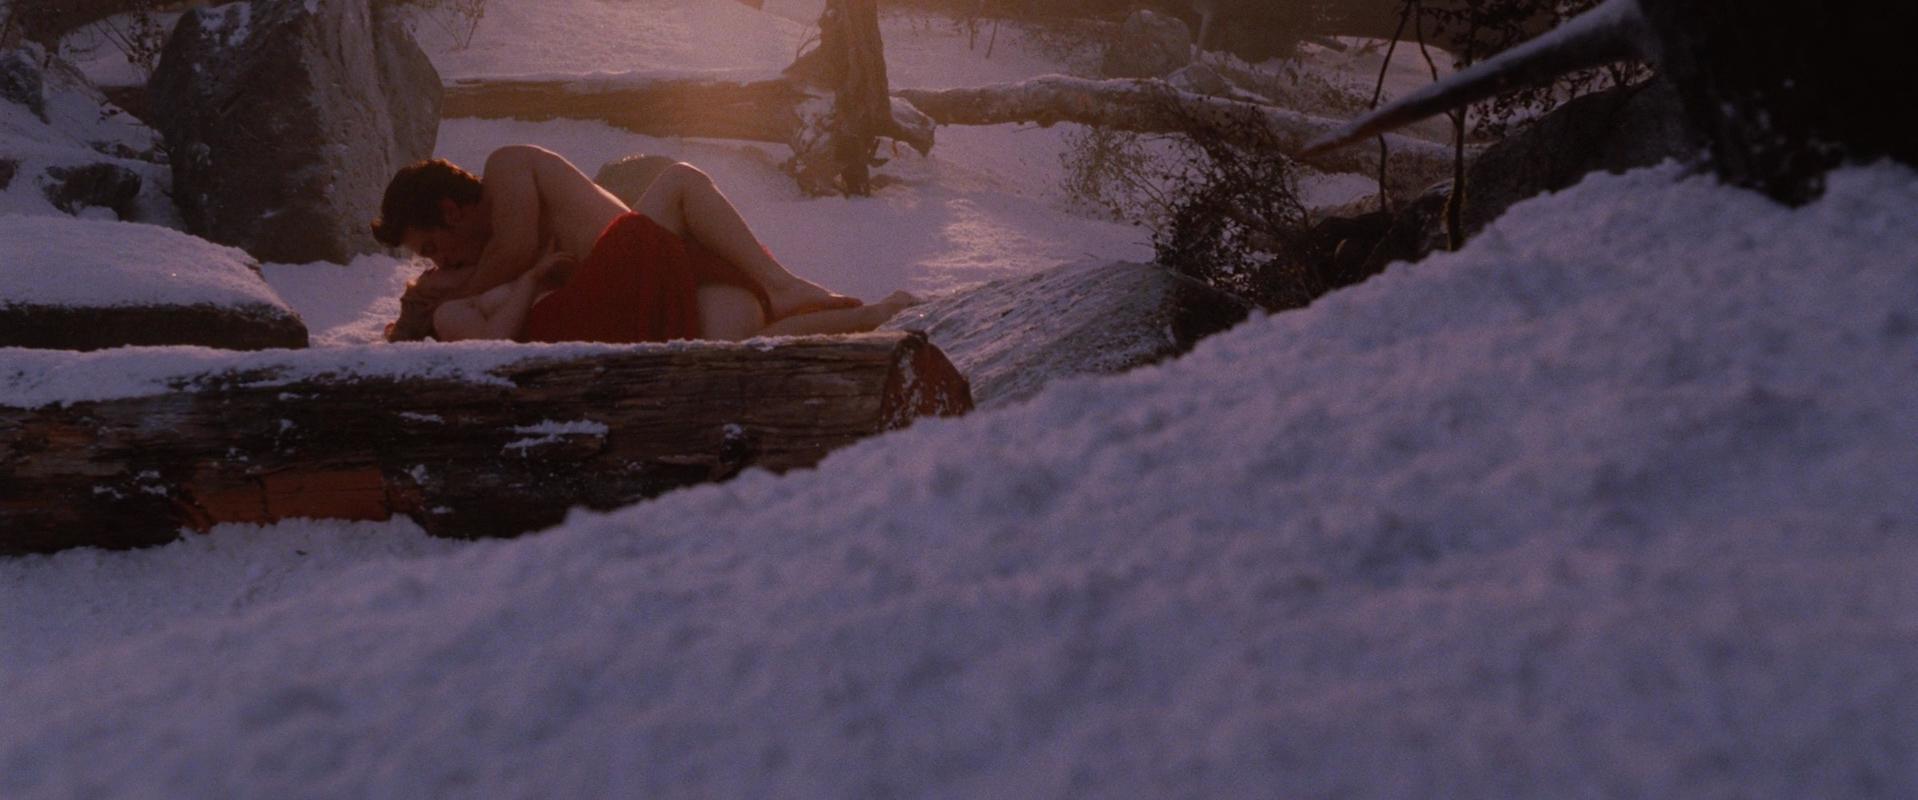 Amanda Seyfried sexy - Red Riding Hood (2011)